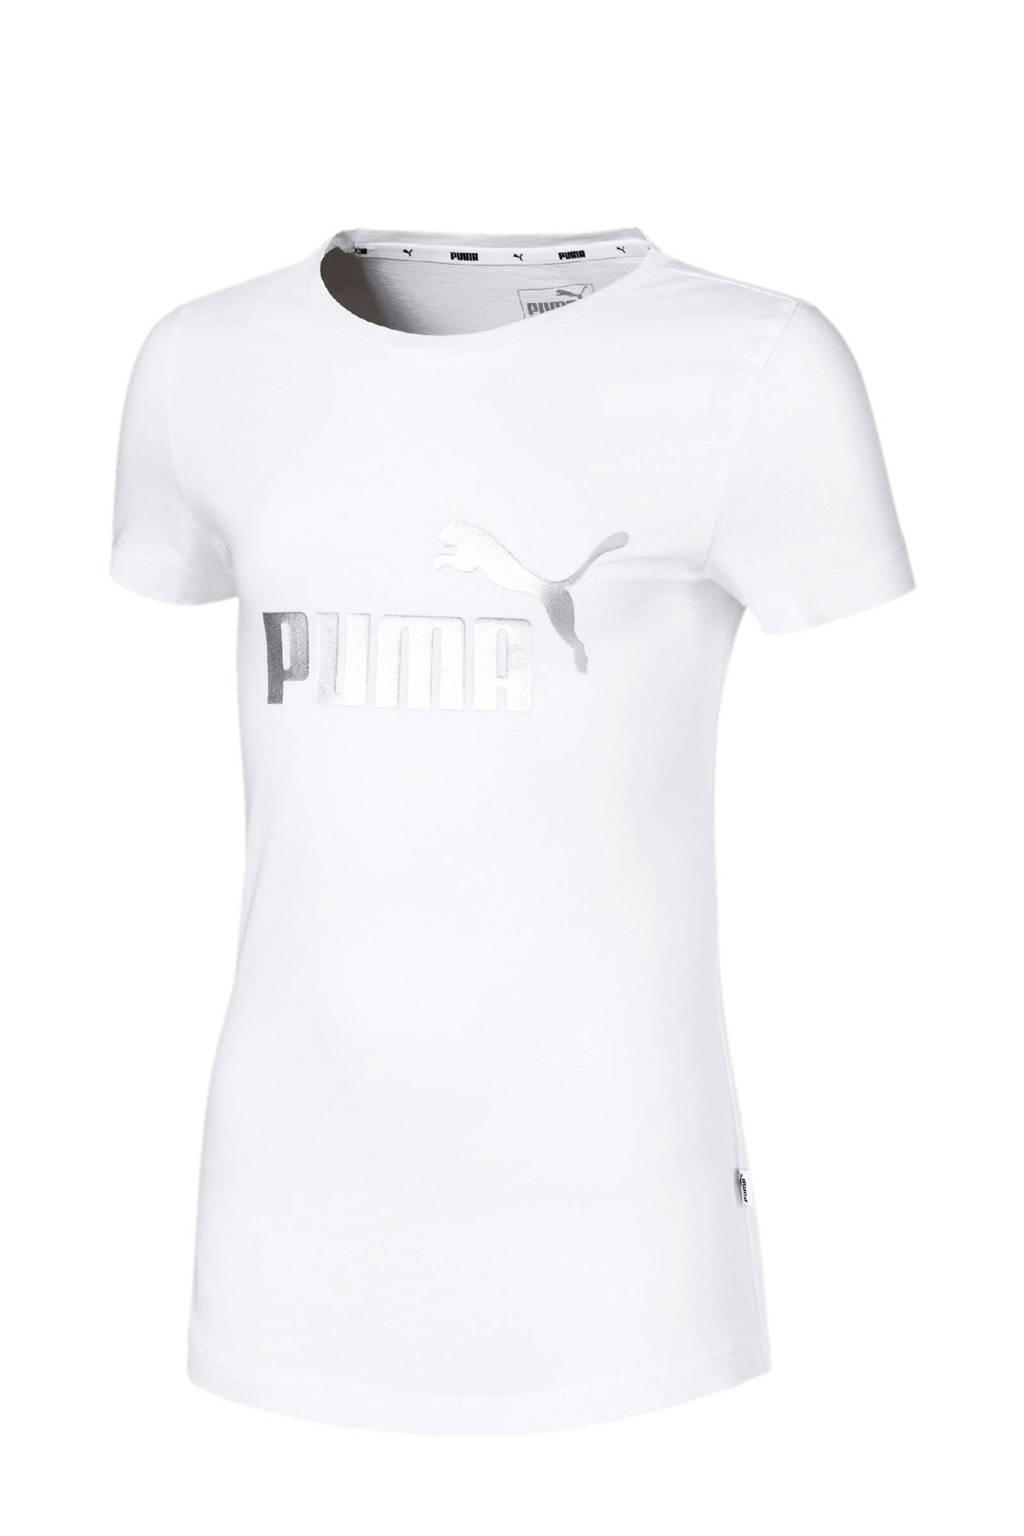 Puma T-shirt wit, Wit